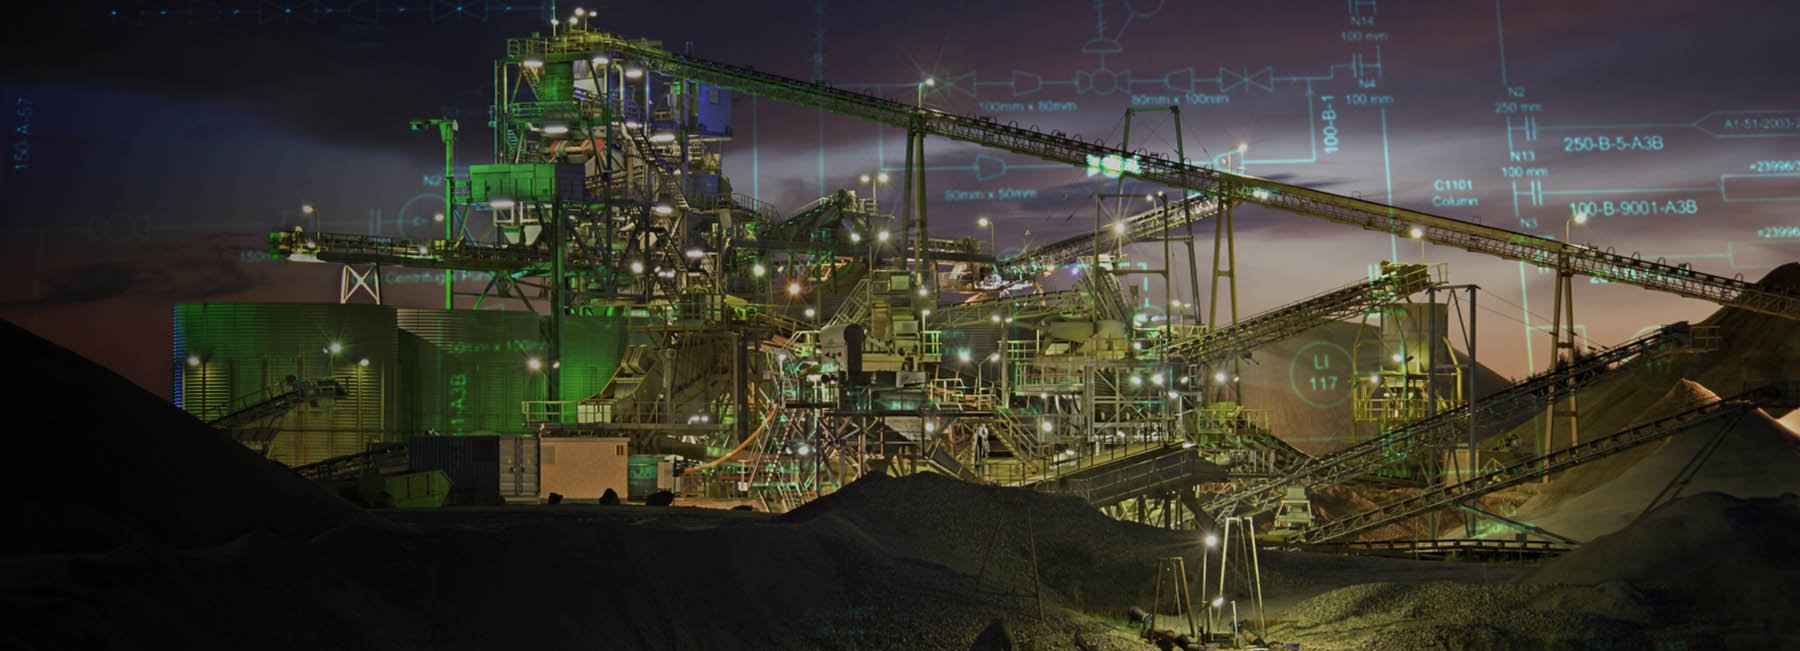 aveva-mining-technology